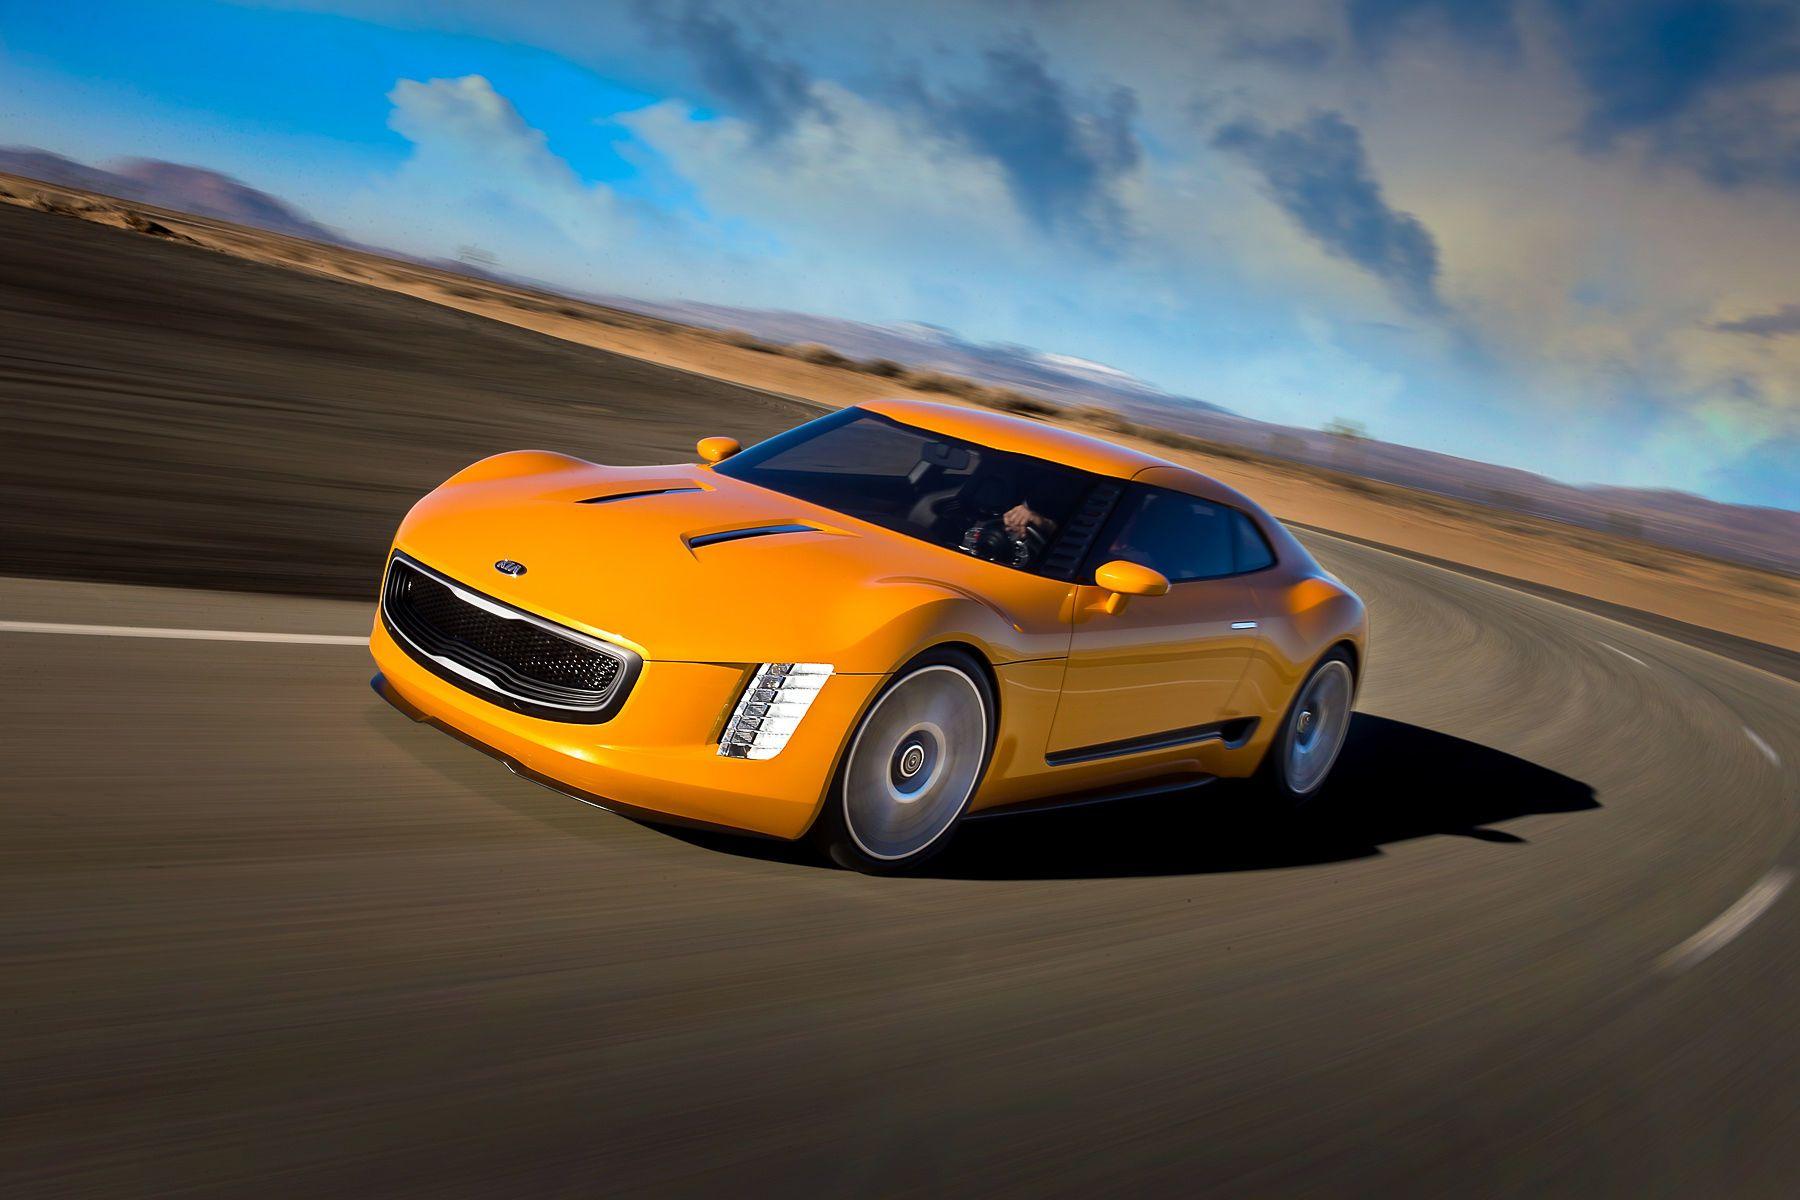 Kia GT-4 Stinger concept